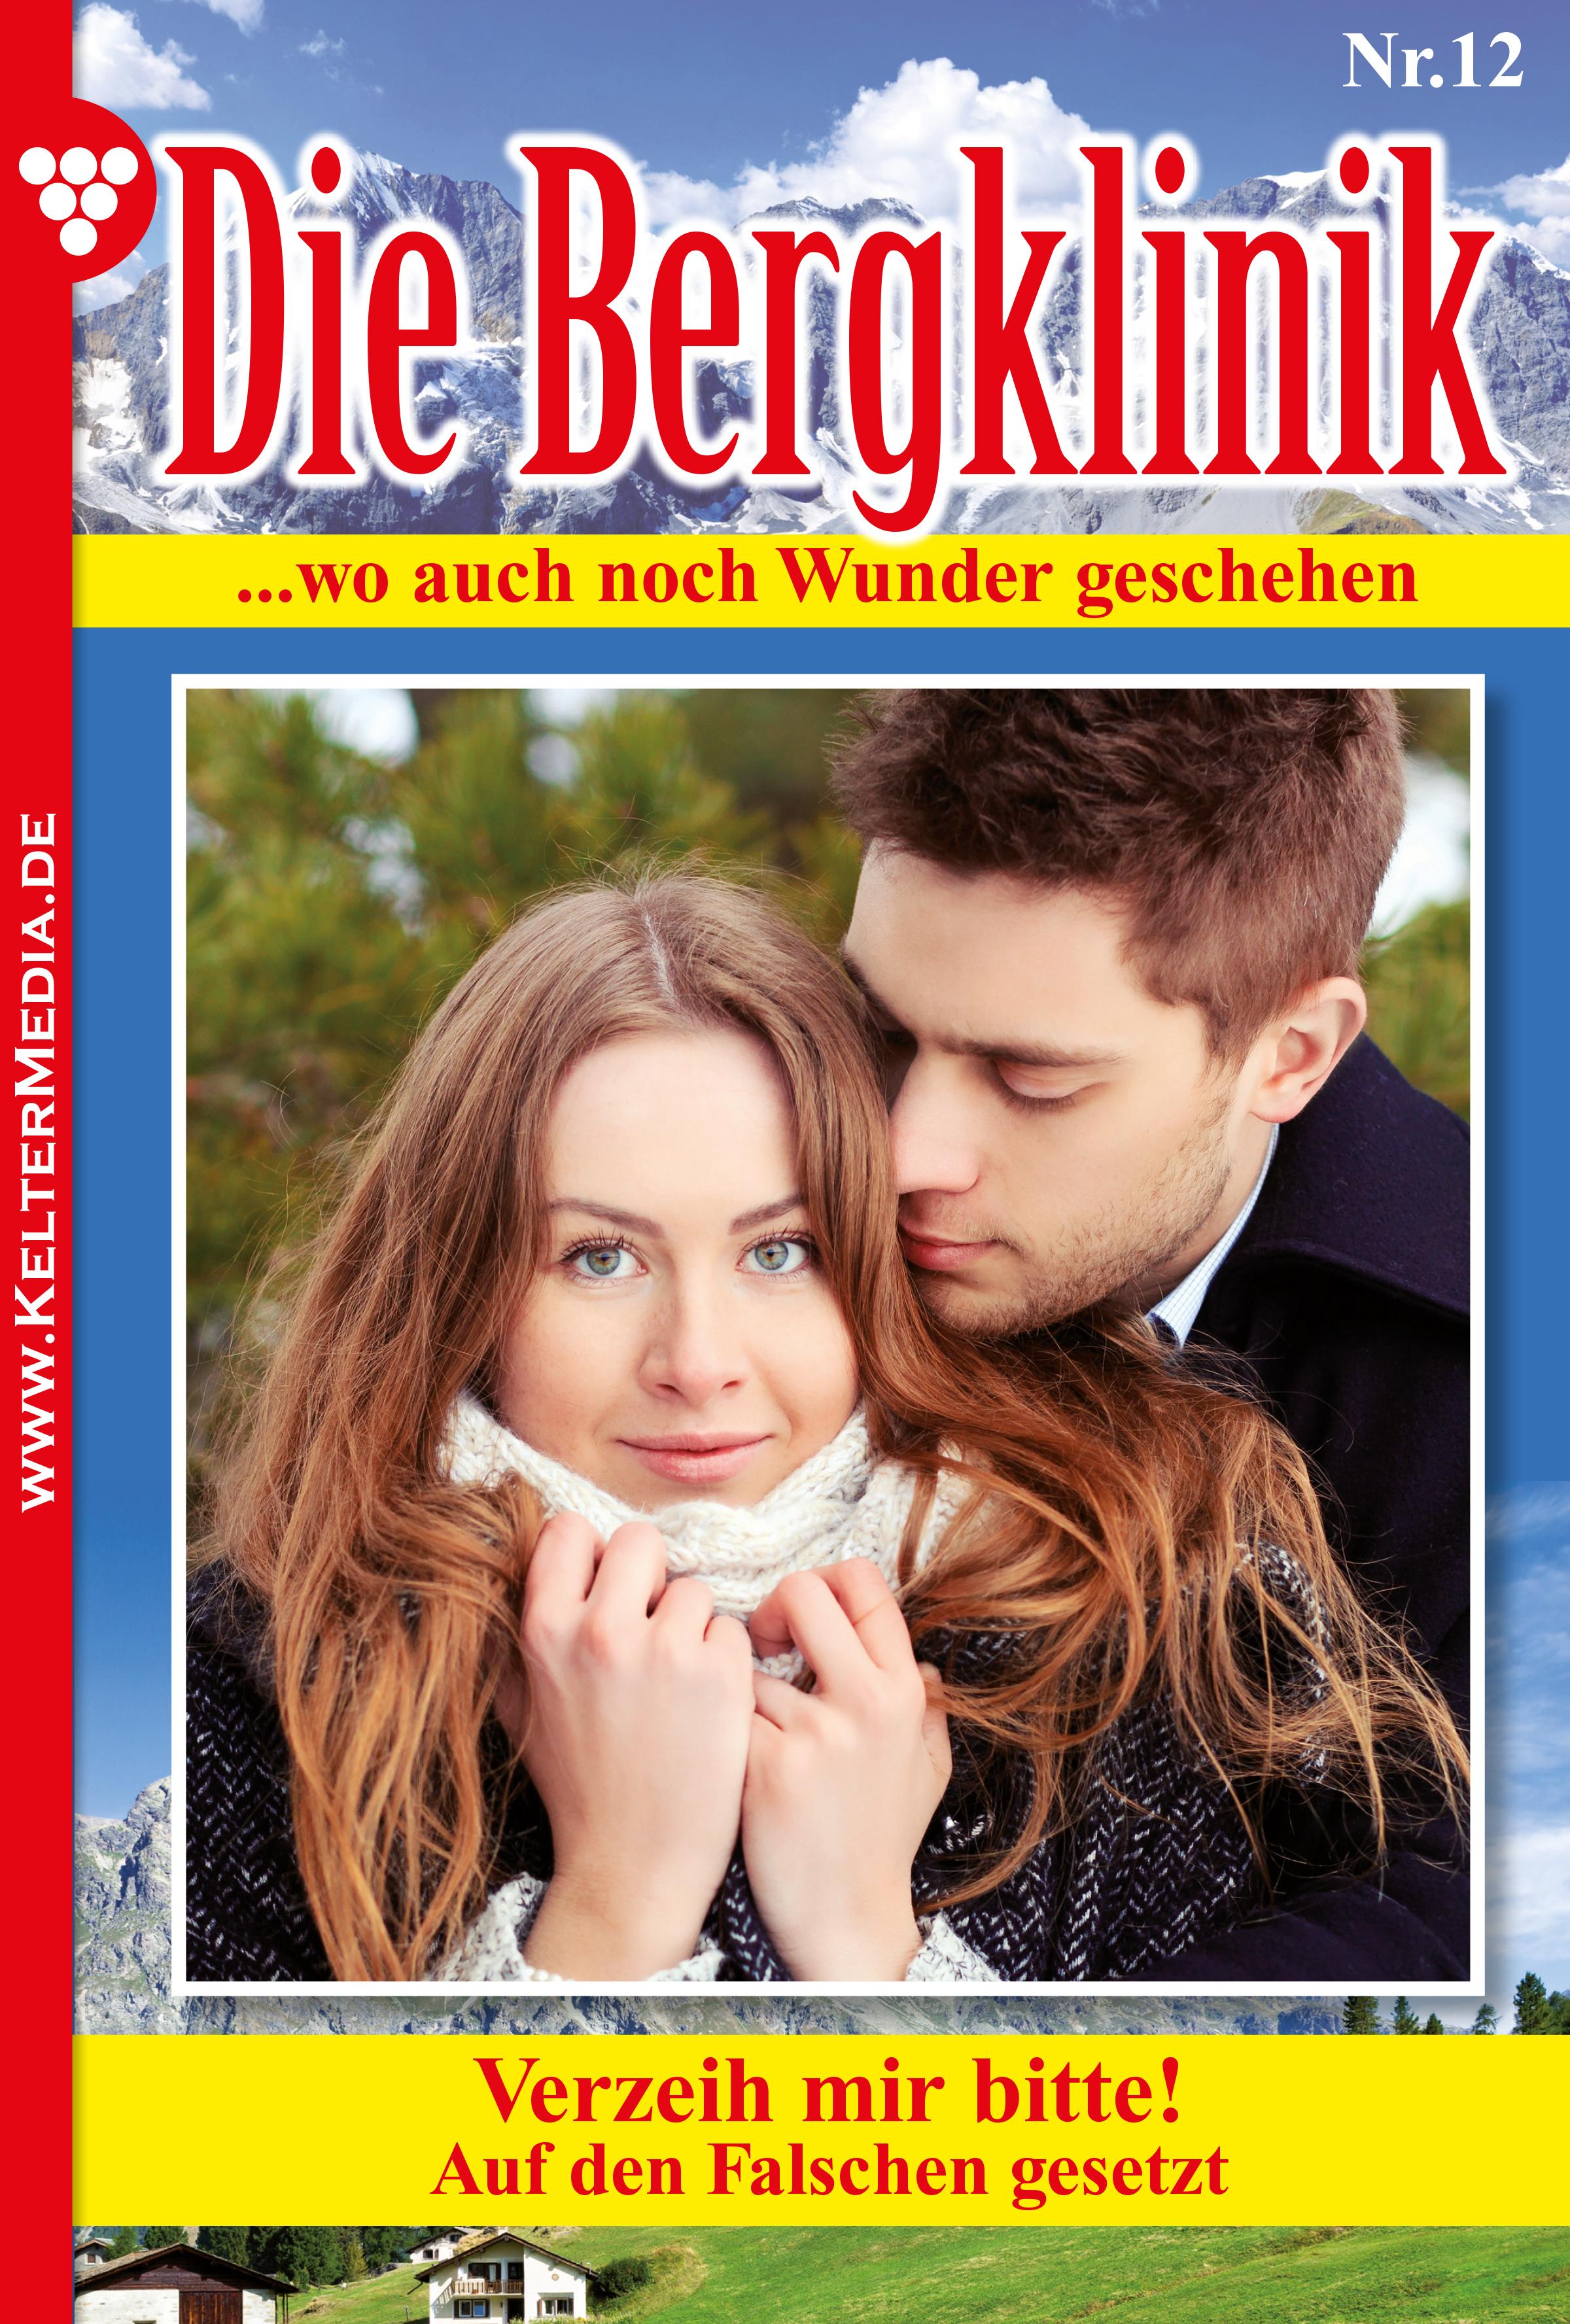 Hans-Peter Lehnert Die Bergklinik 12 – Arztroman hans peter holst den lille hornblaeser et digt danish edition